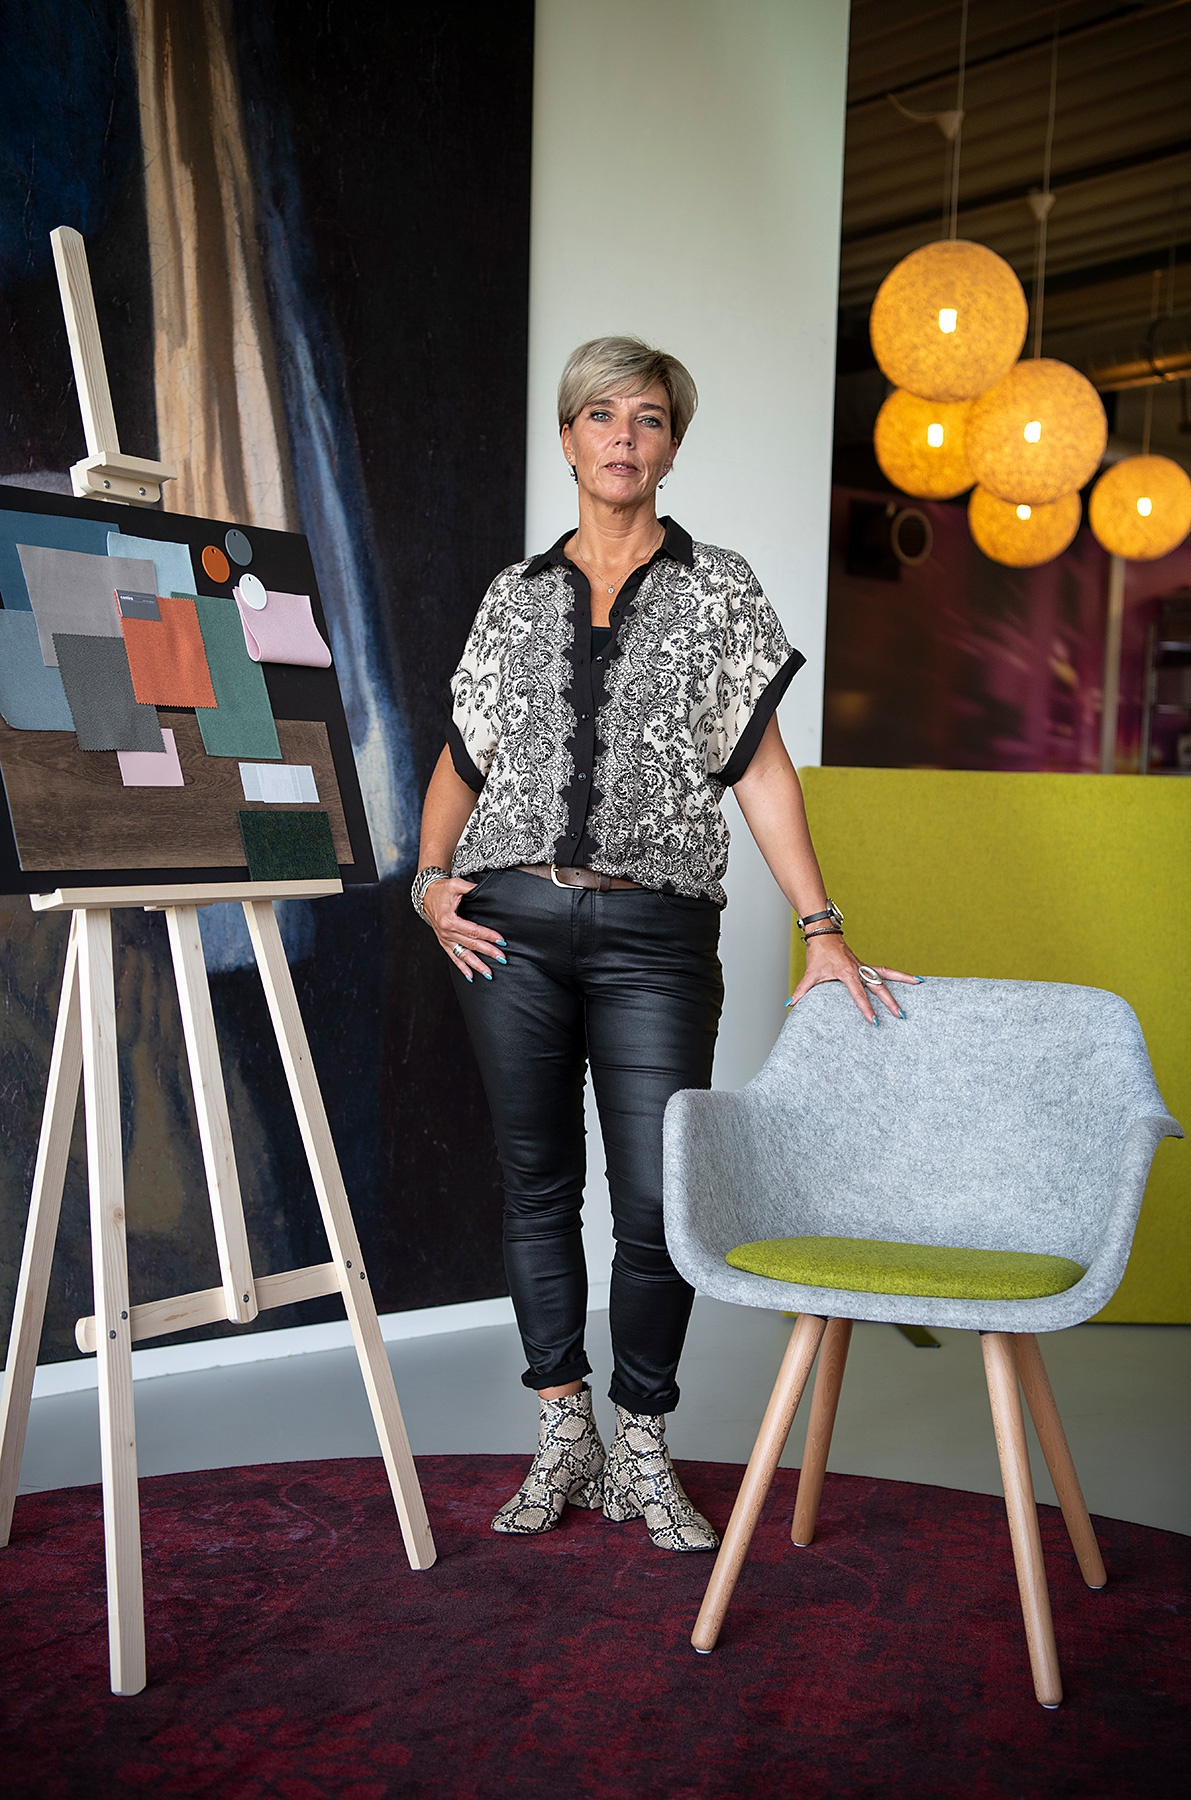 CEKA Nederland medewerker Willeke van der Heijden